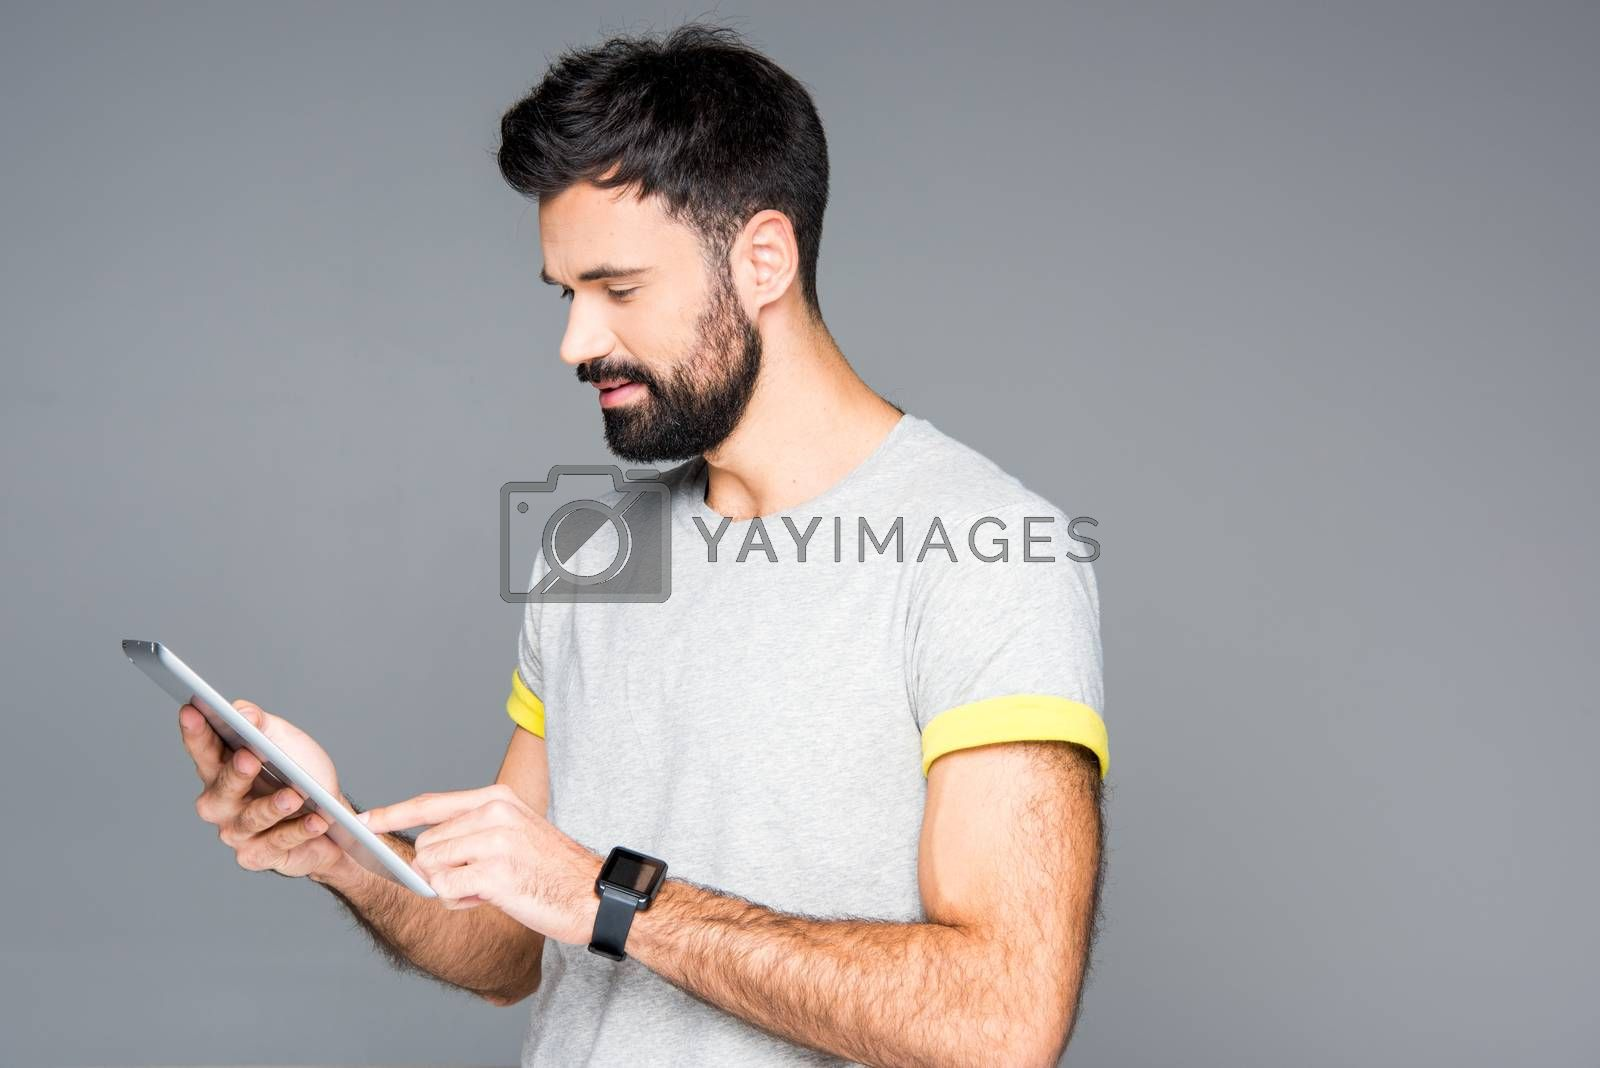 Smiling bearded man using digital tablet on grey